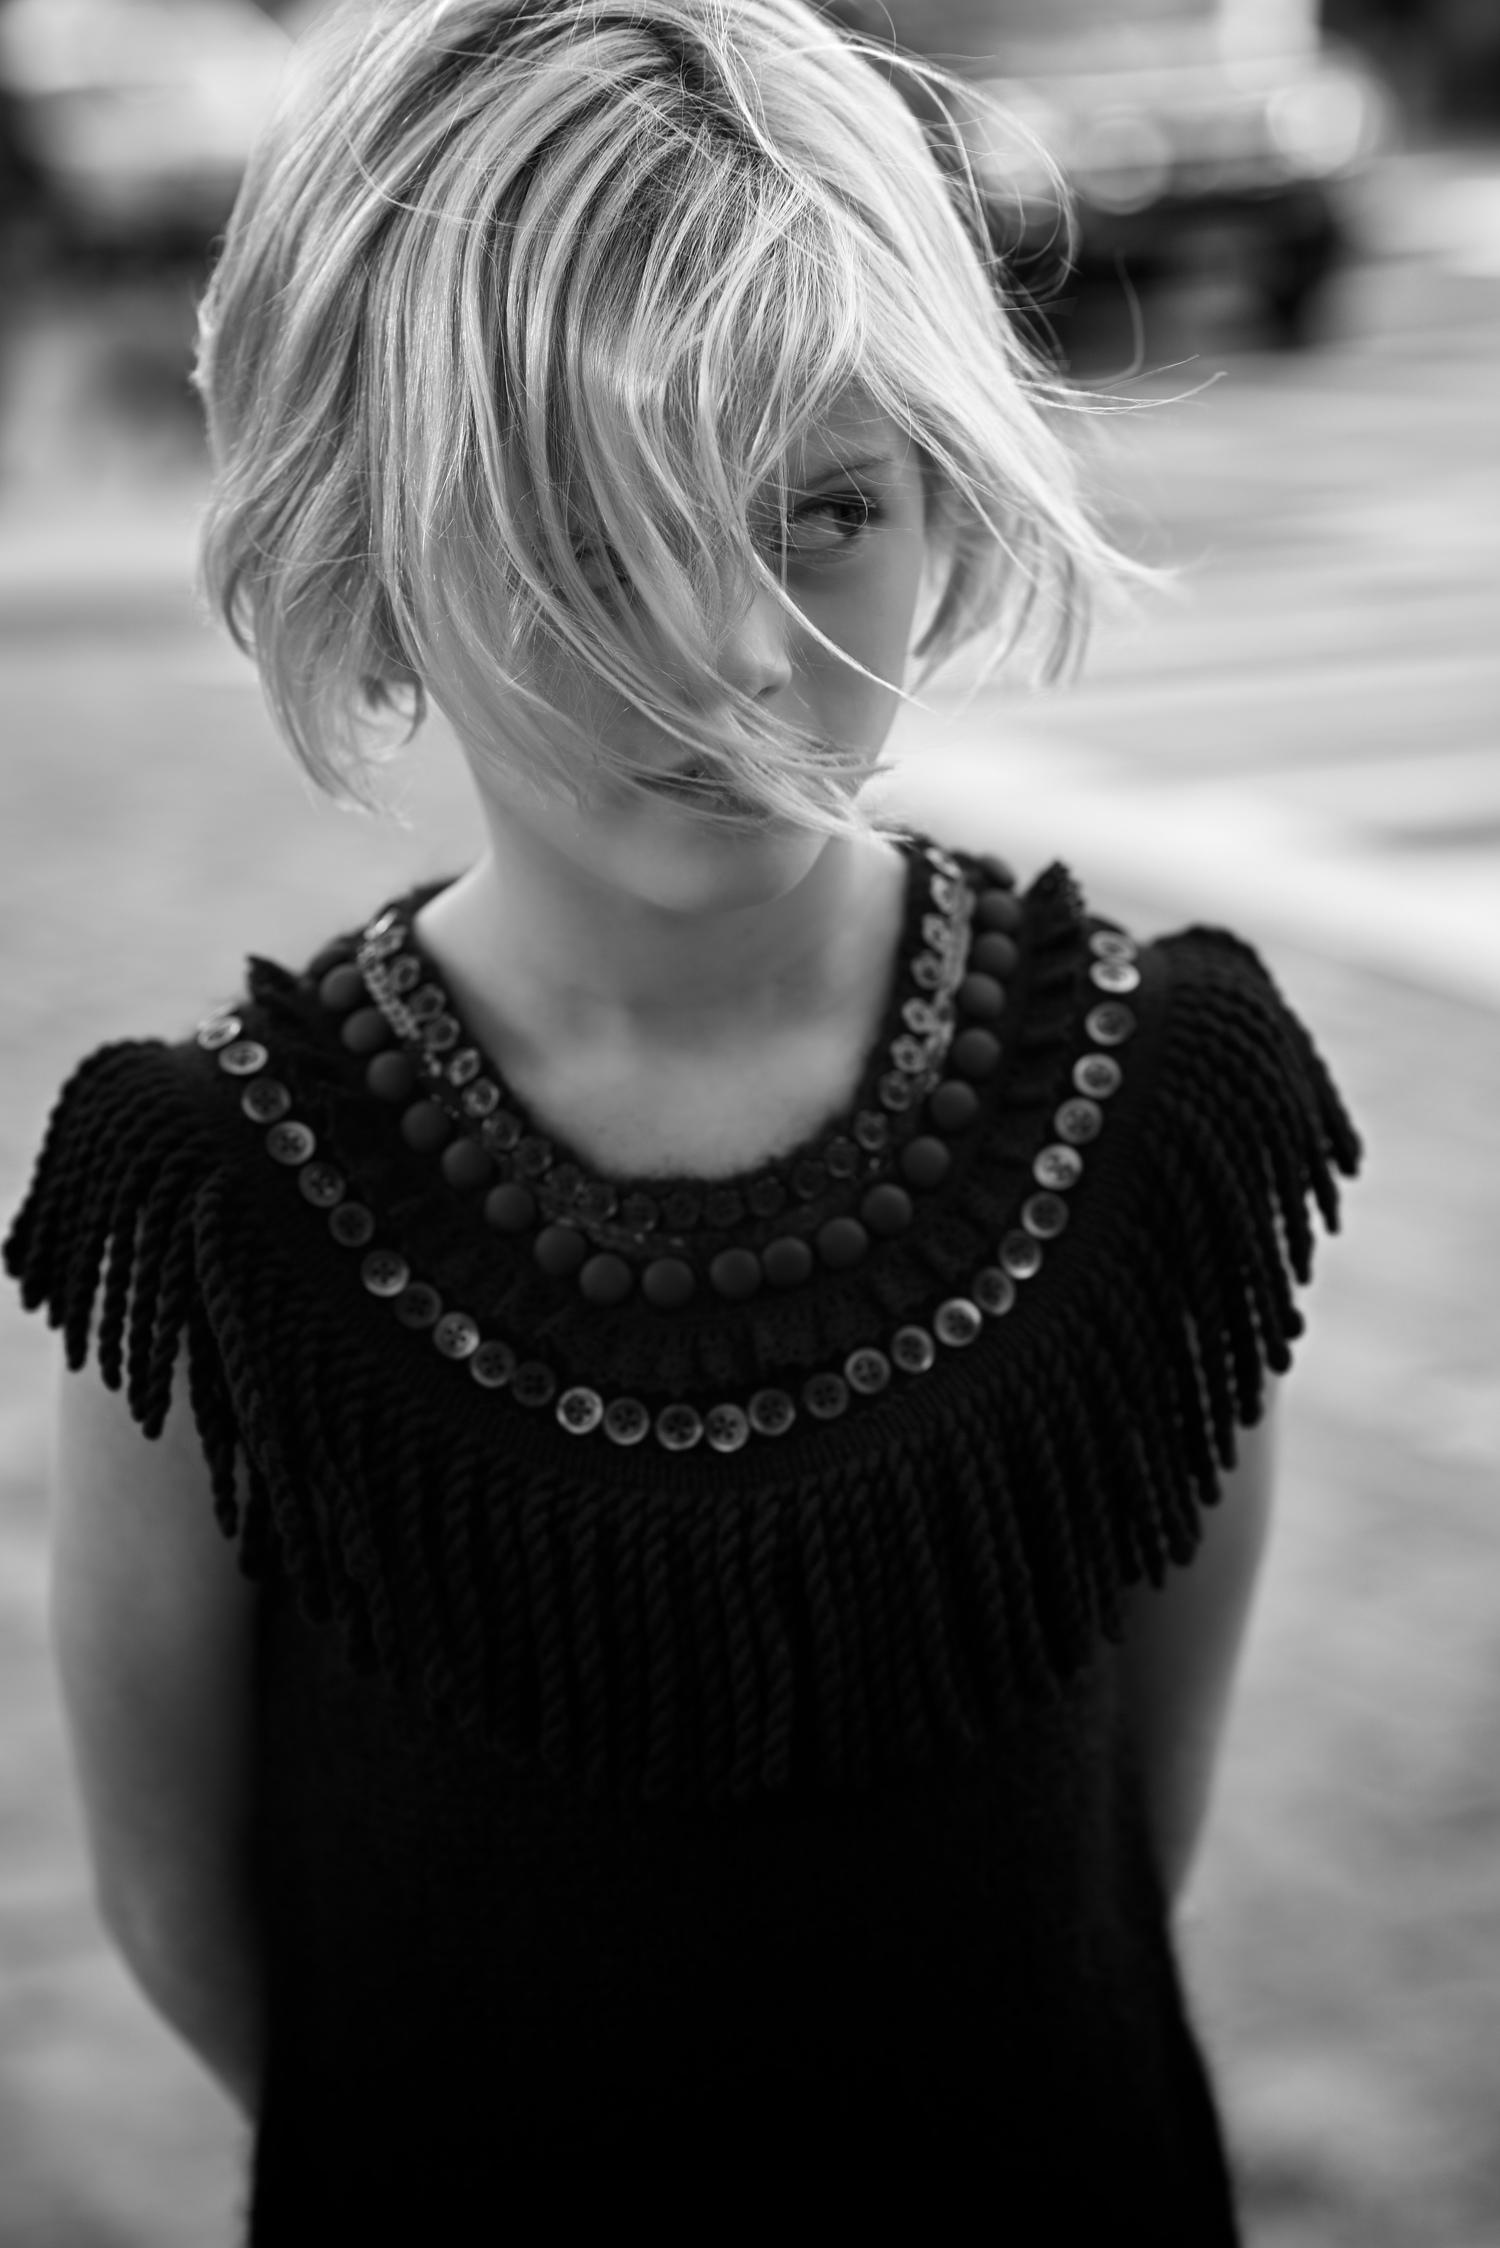 Enfant+Street+Style+by+Gina+Kim+Photography-20.jpeg